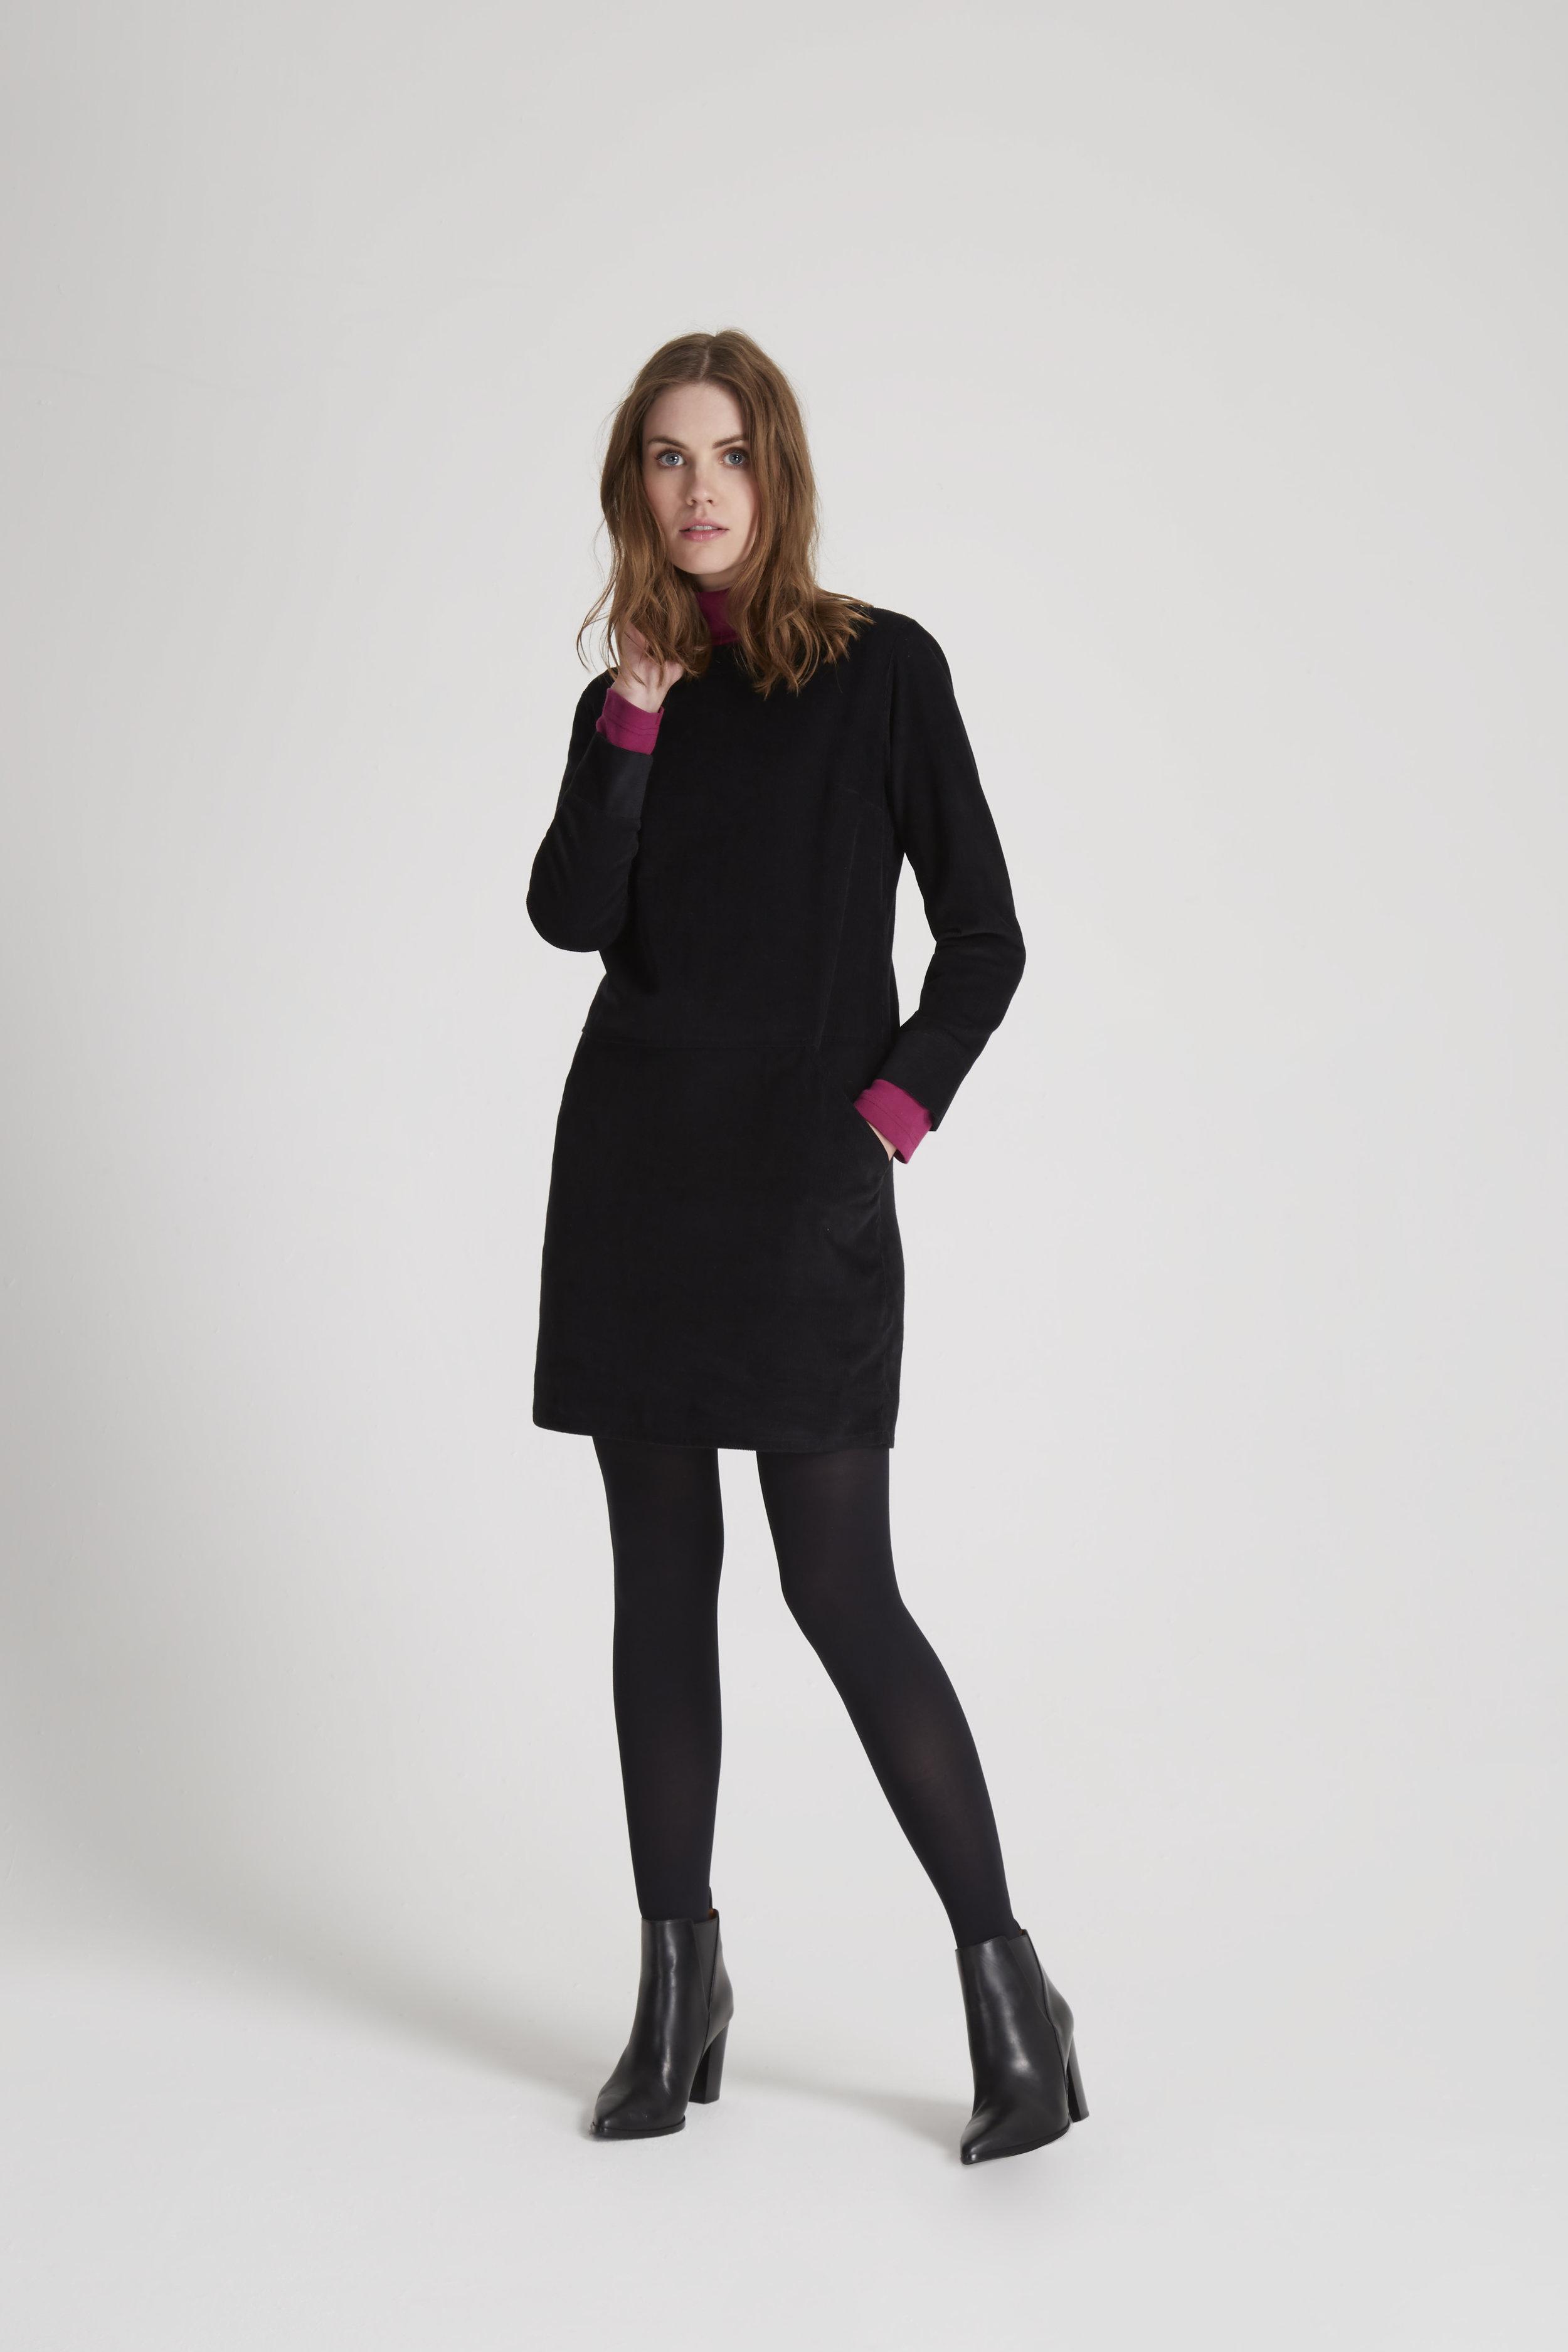 ursula-corduroy-dress-in-black-89ca5fa020ae.jpg